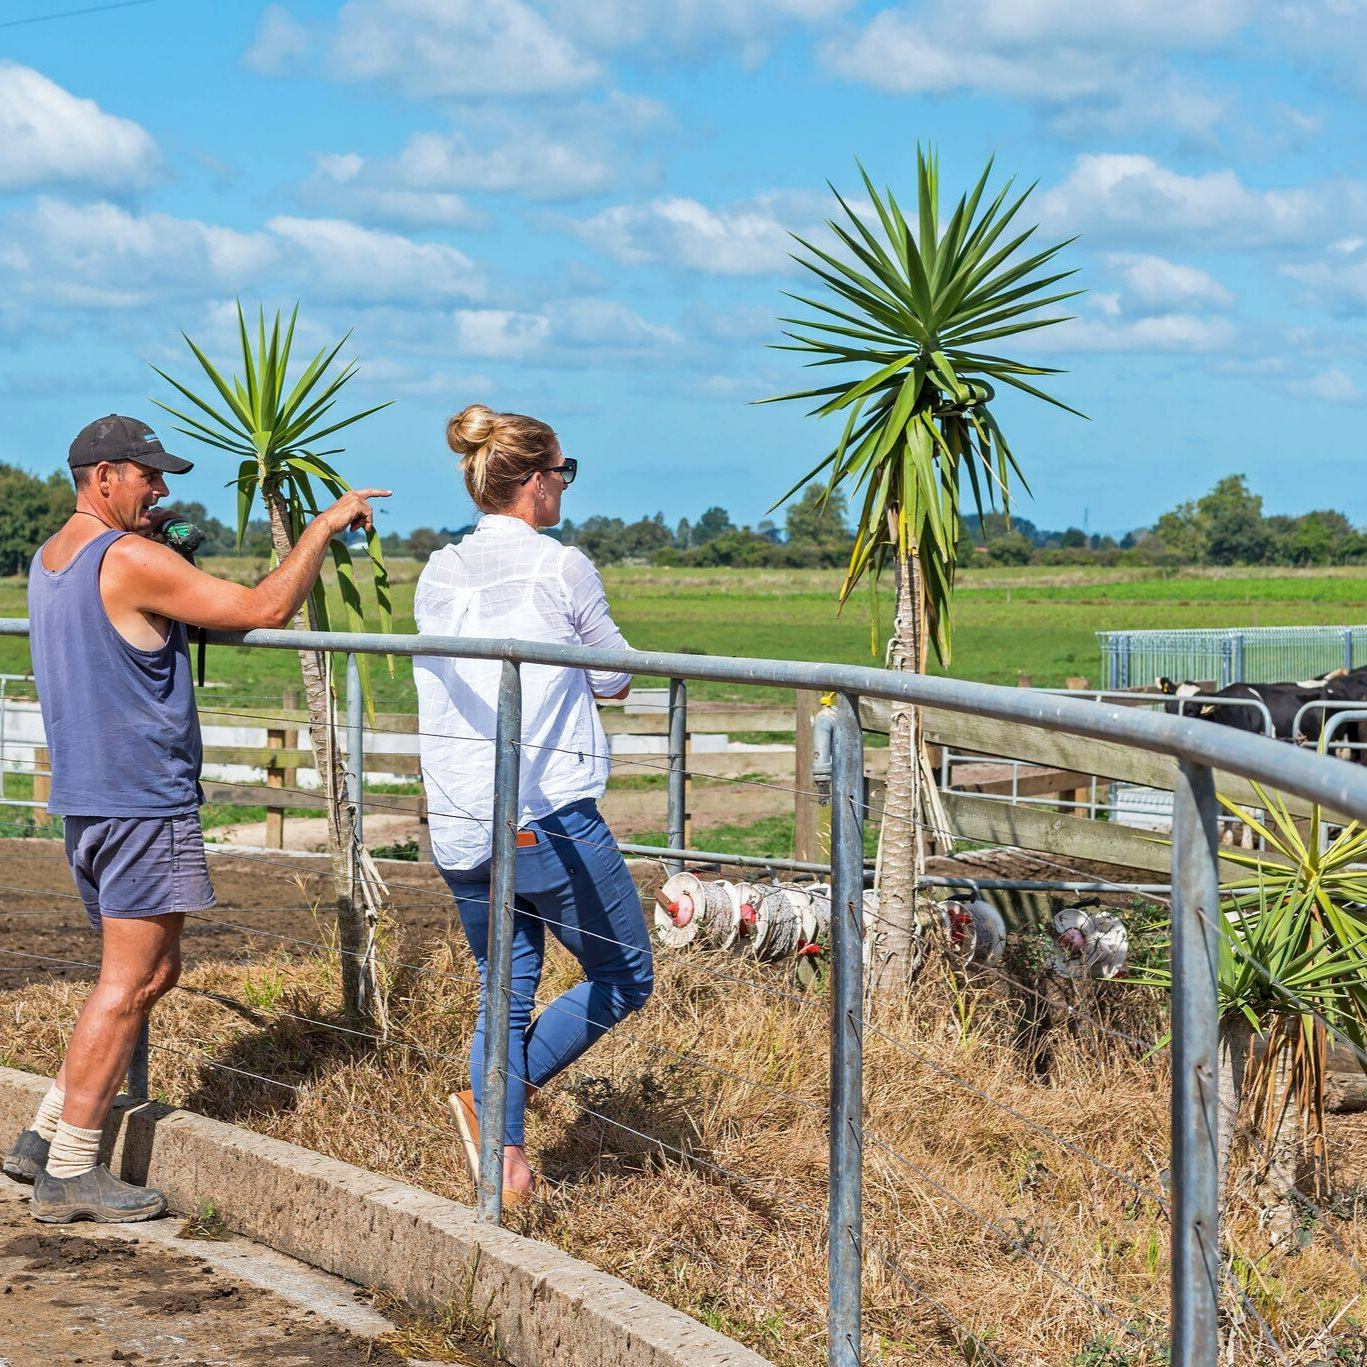 Amanda Looks At Farm Infrastructure